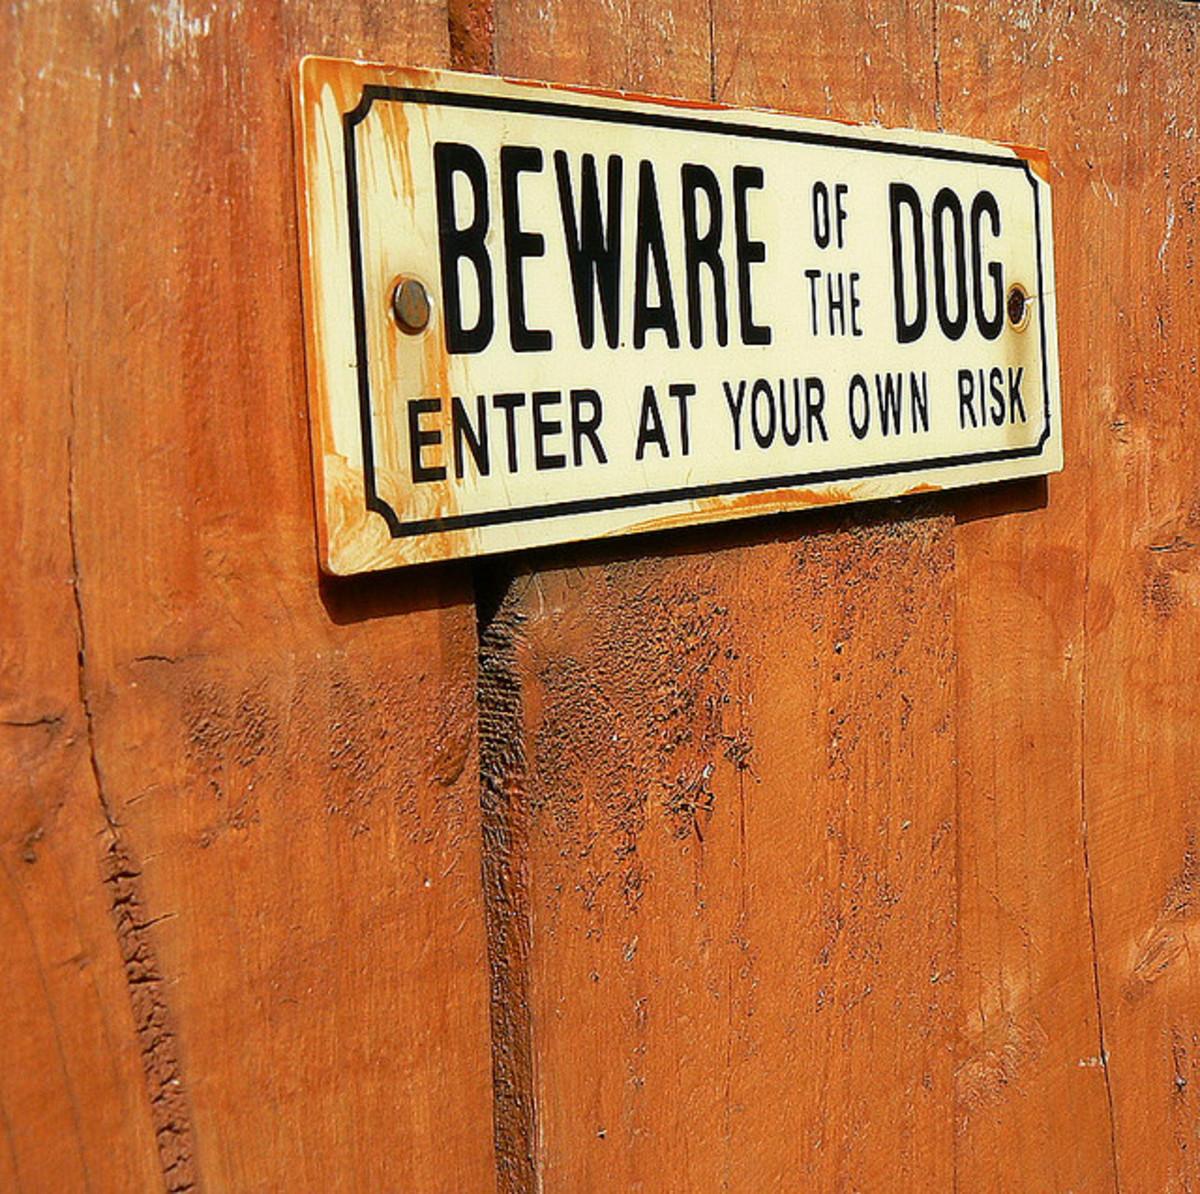 Warn anyone entering your yard.